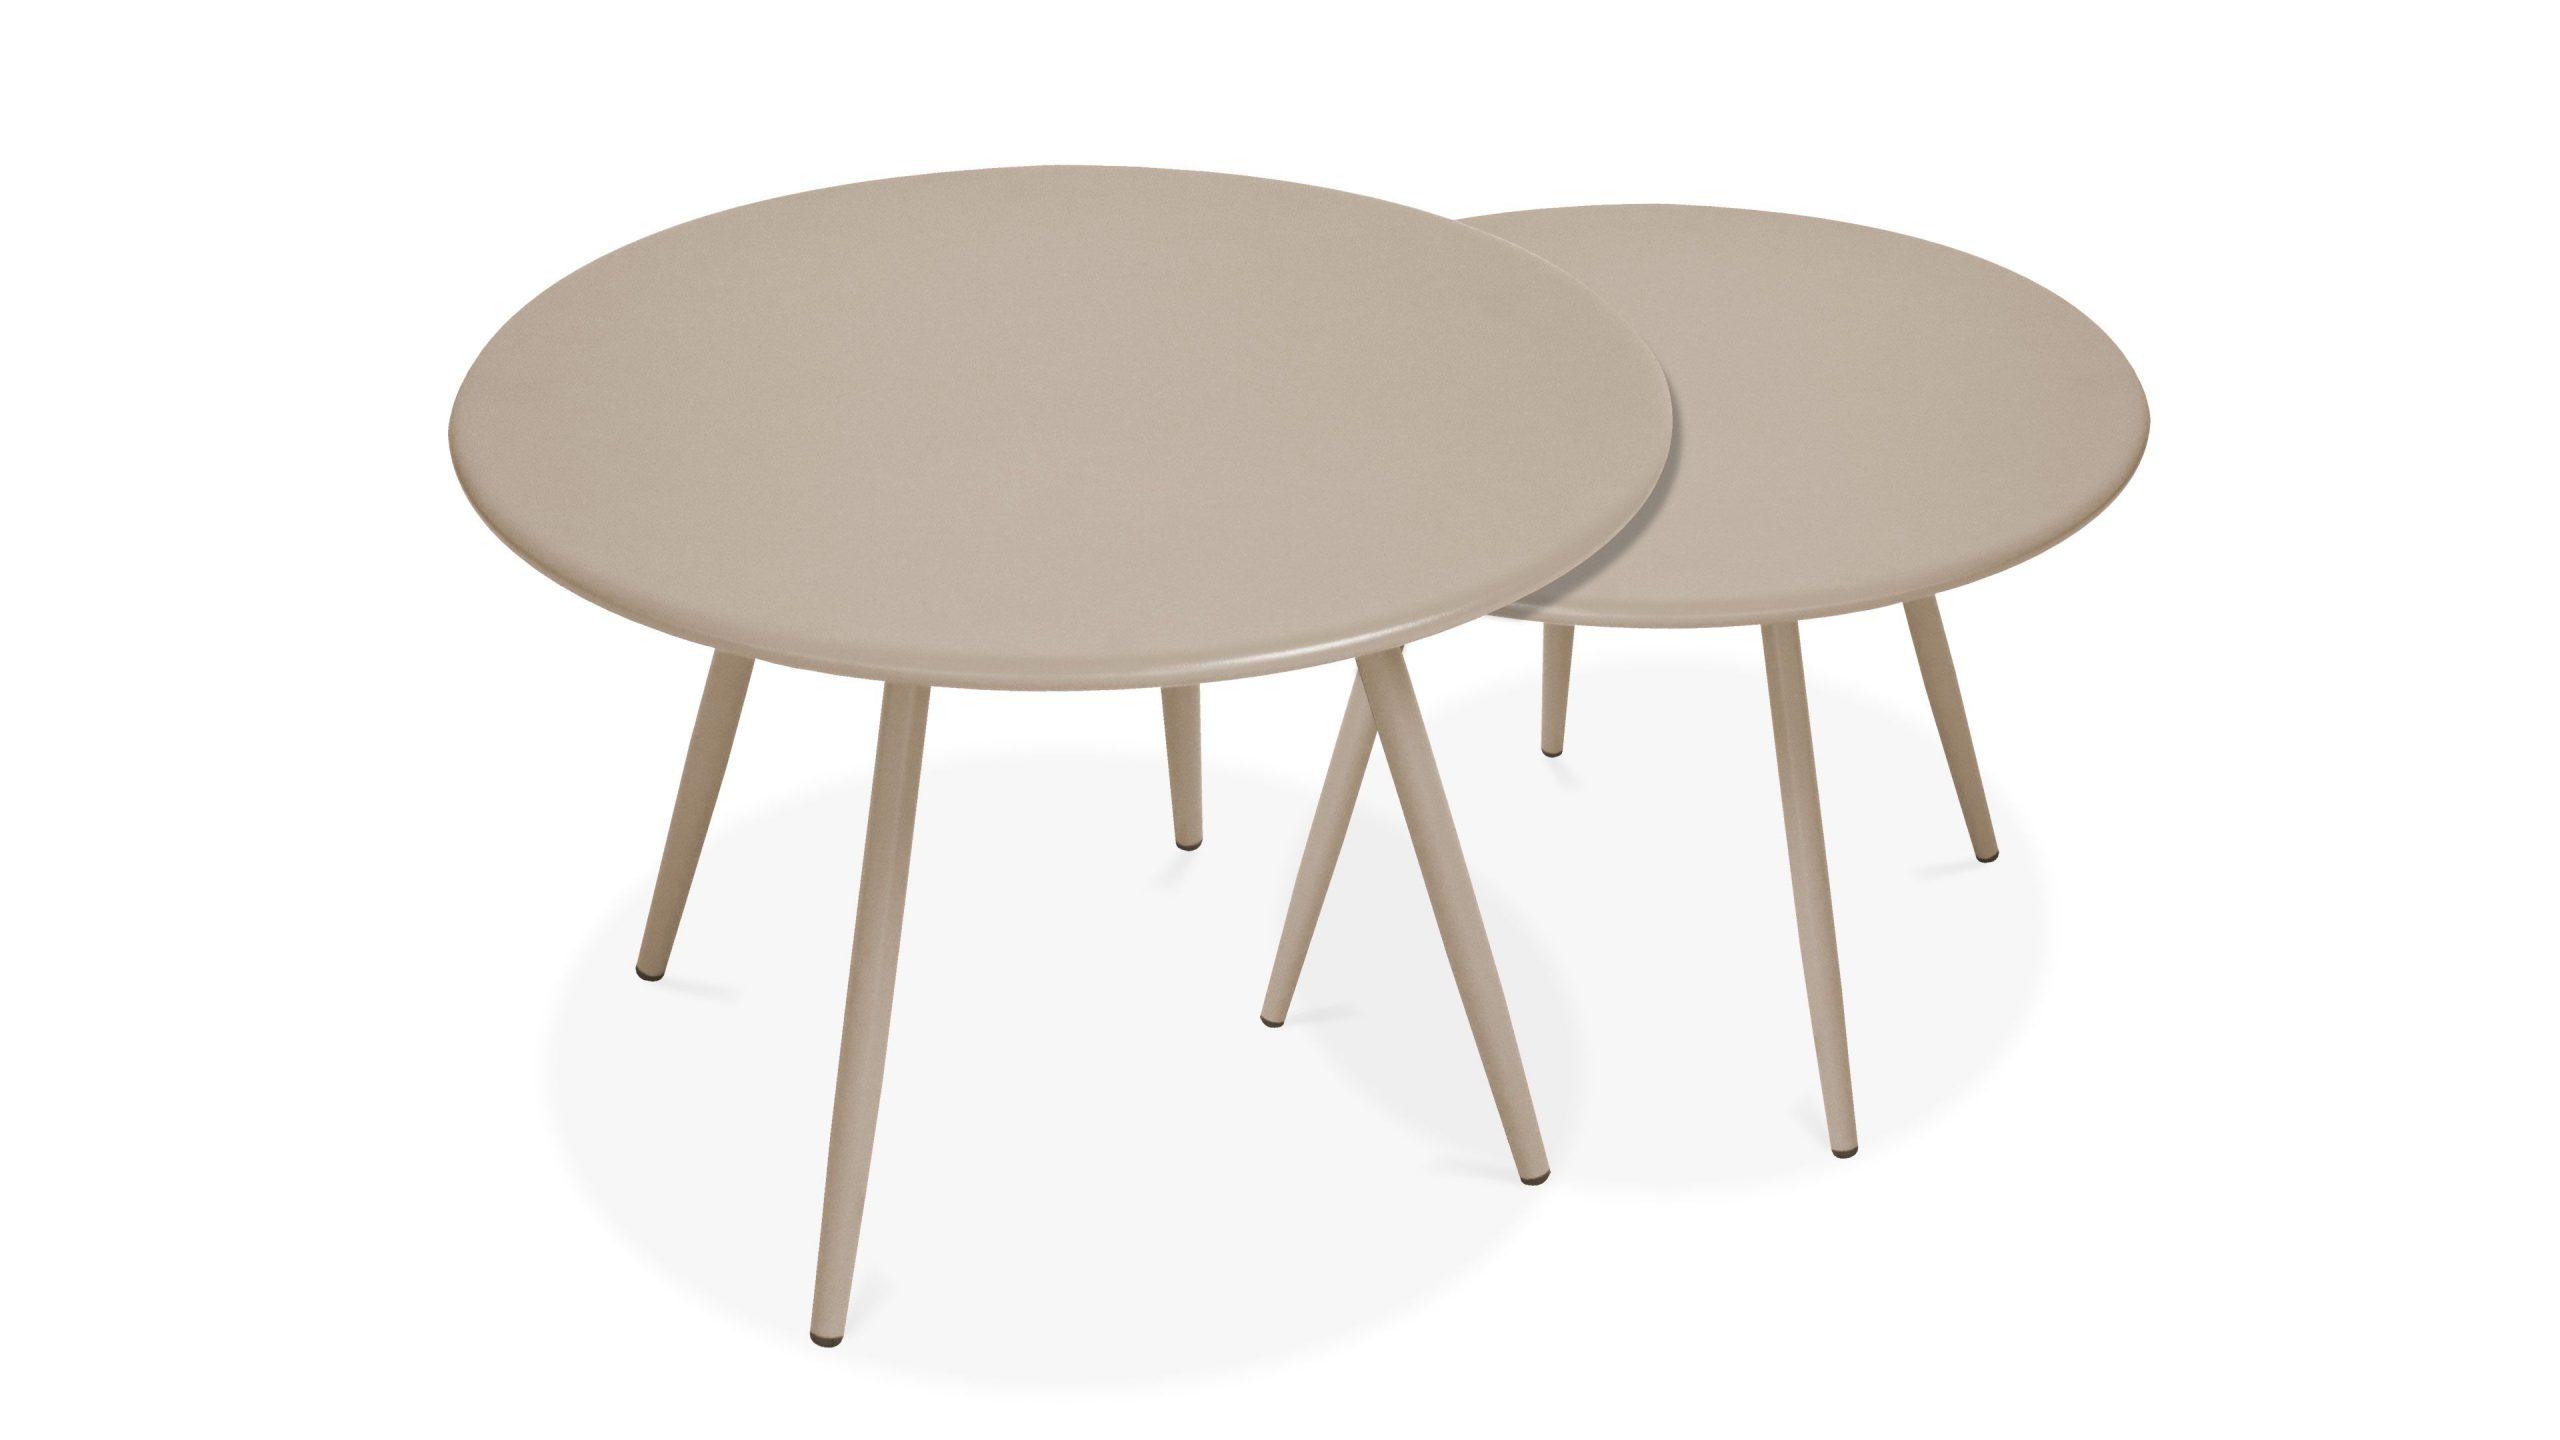 Table Basse Ronde Gigogne Jardin | Palavas serapportantà Table Basse De Jardin Pas Cher